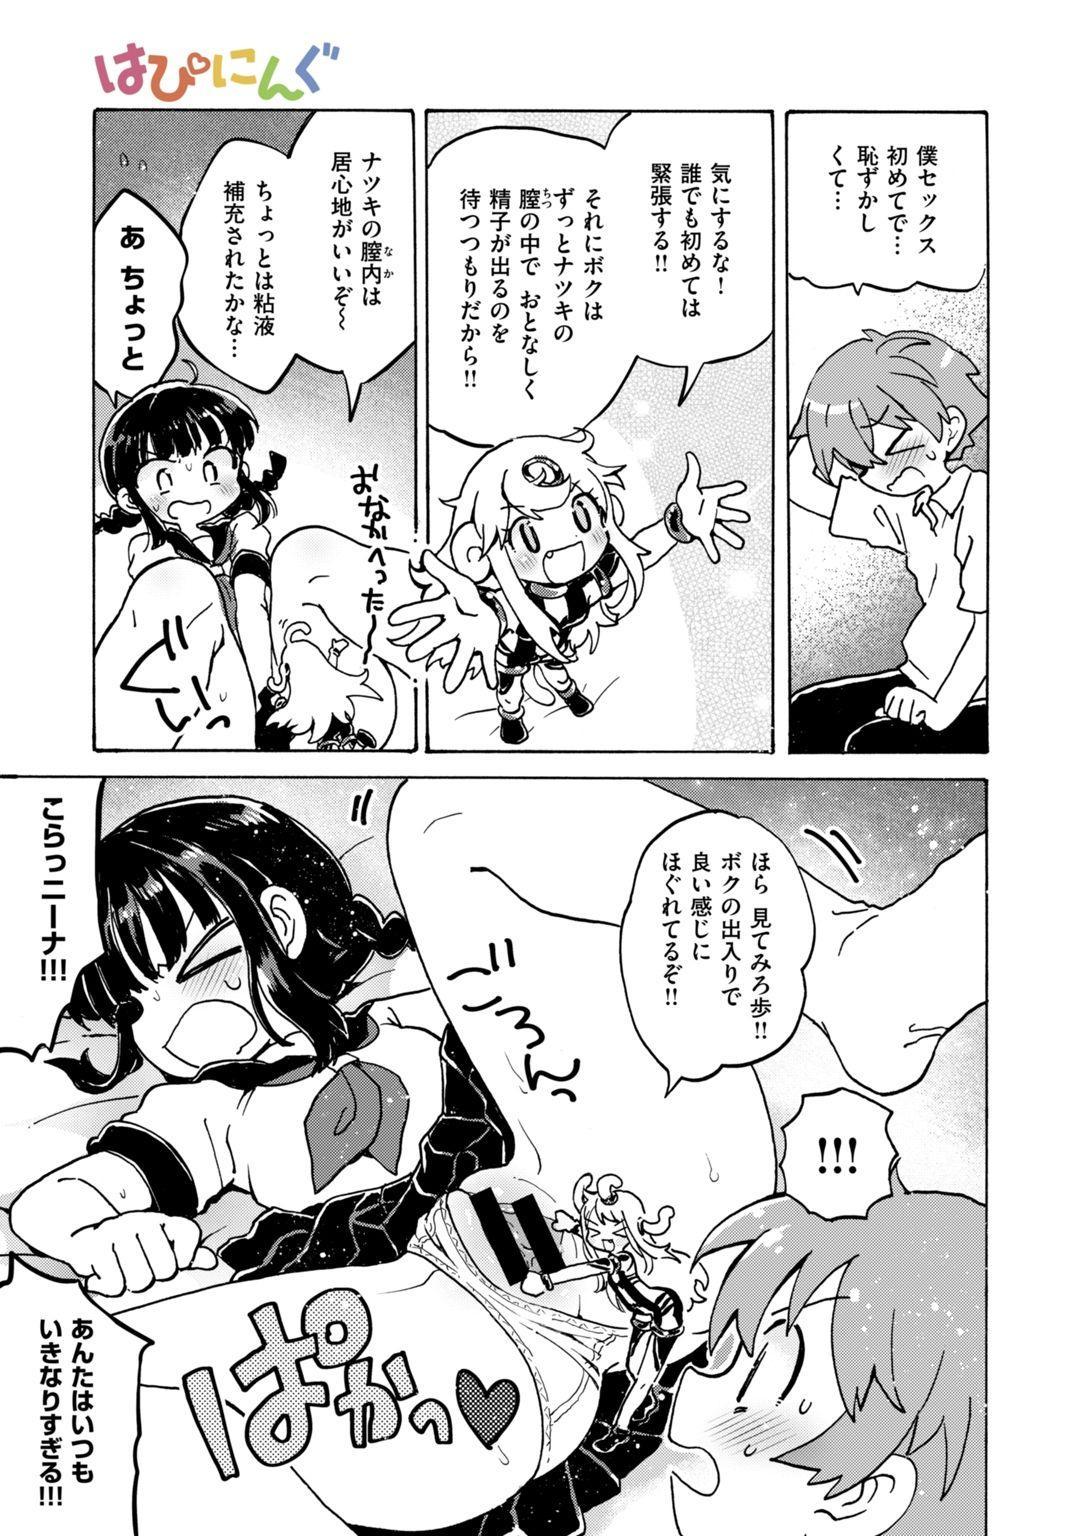 COMIC HAPPINING Vol. 2 17